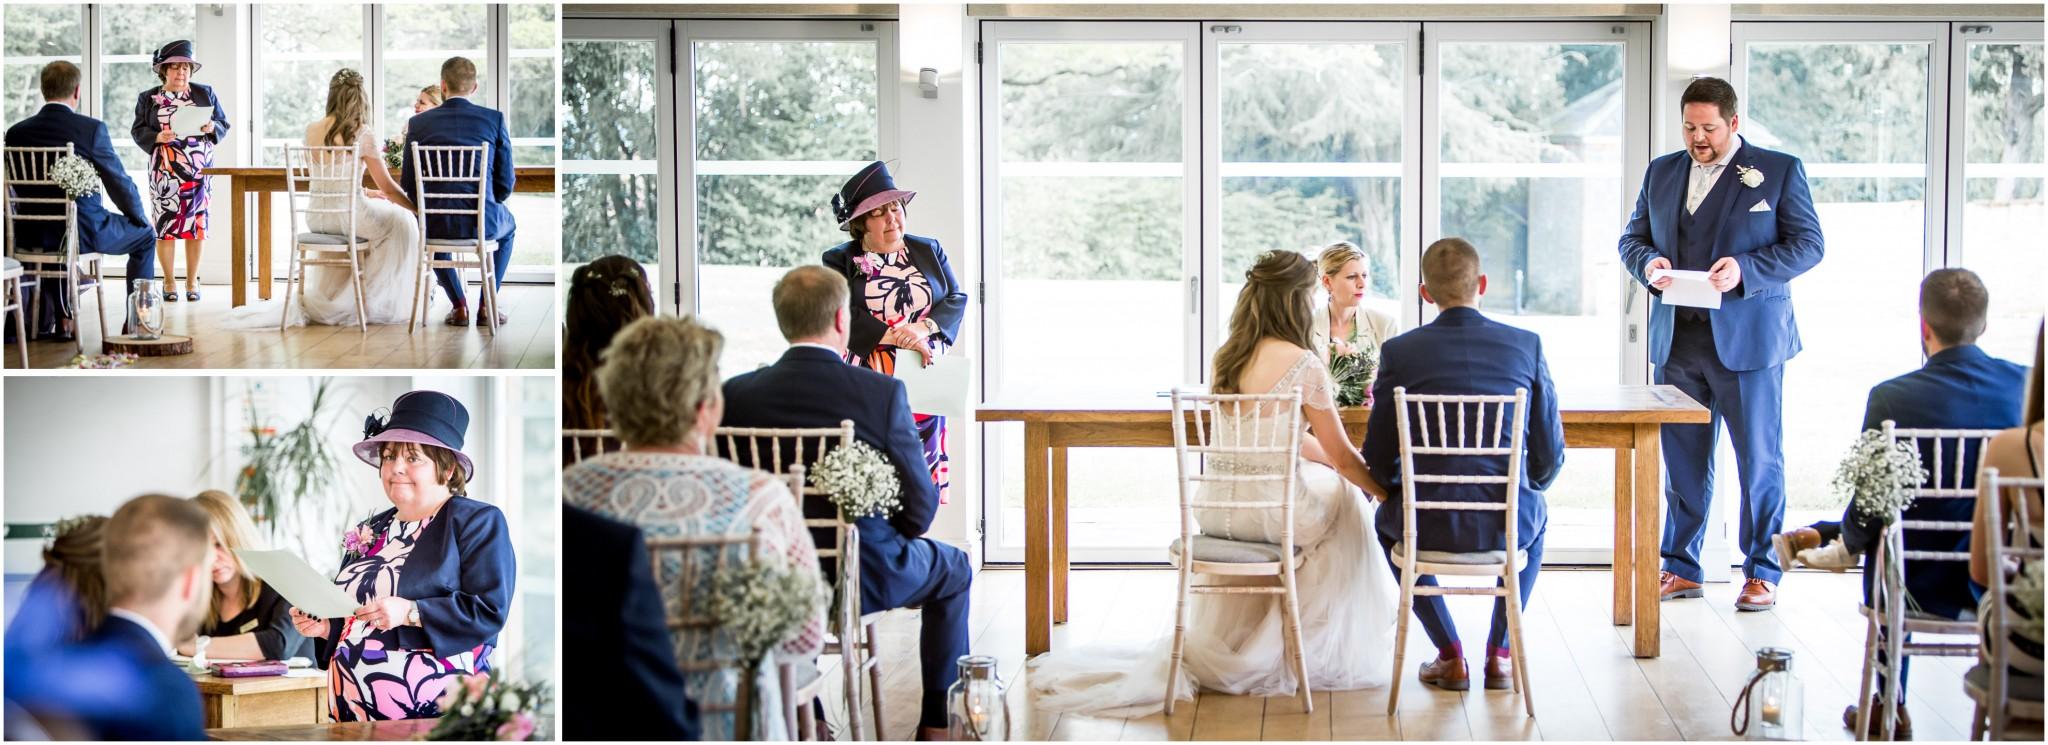 Wasing Park Wedding Photography Wedding Readings